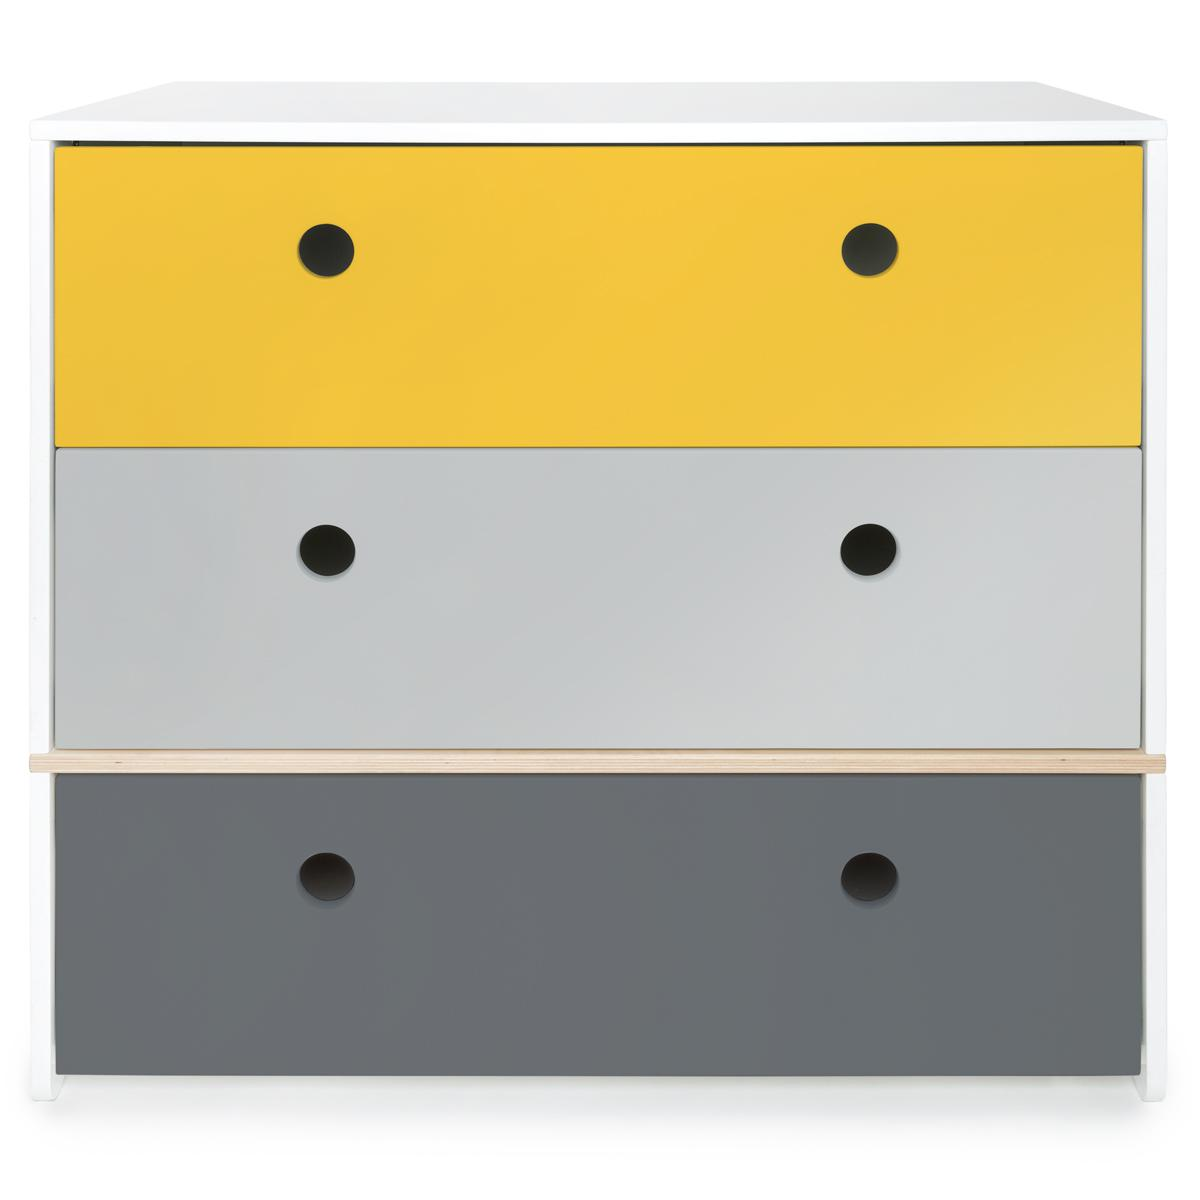 Kommode COLORFLEX Schubladen Farben nectar yellow-pearl grey-space grey